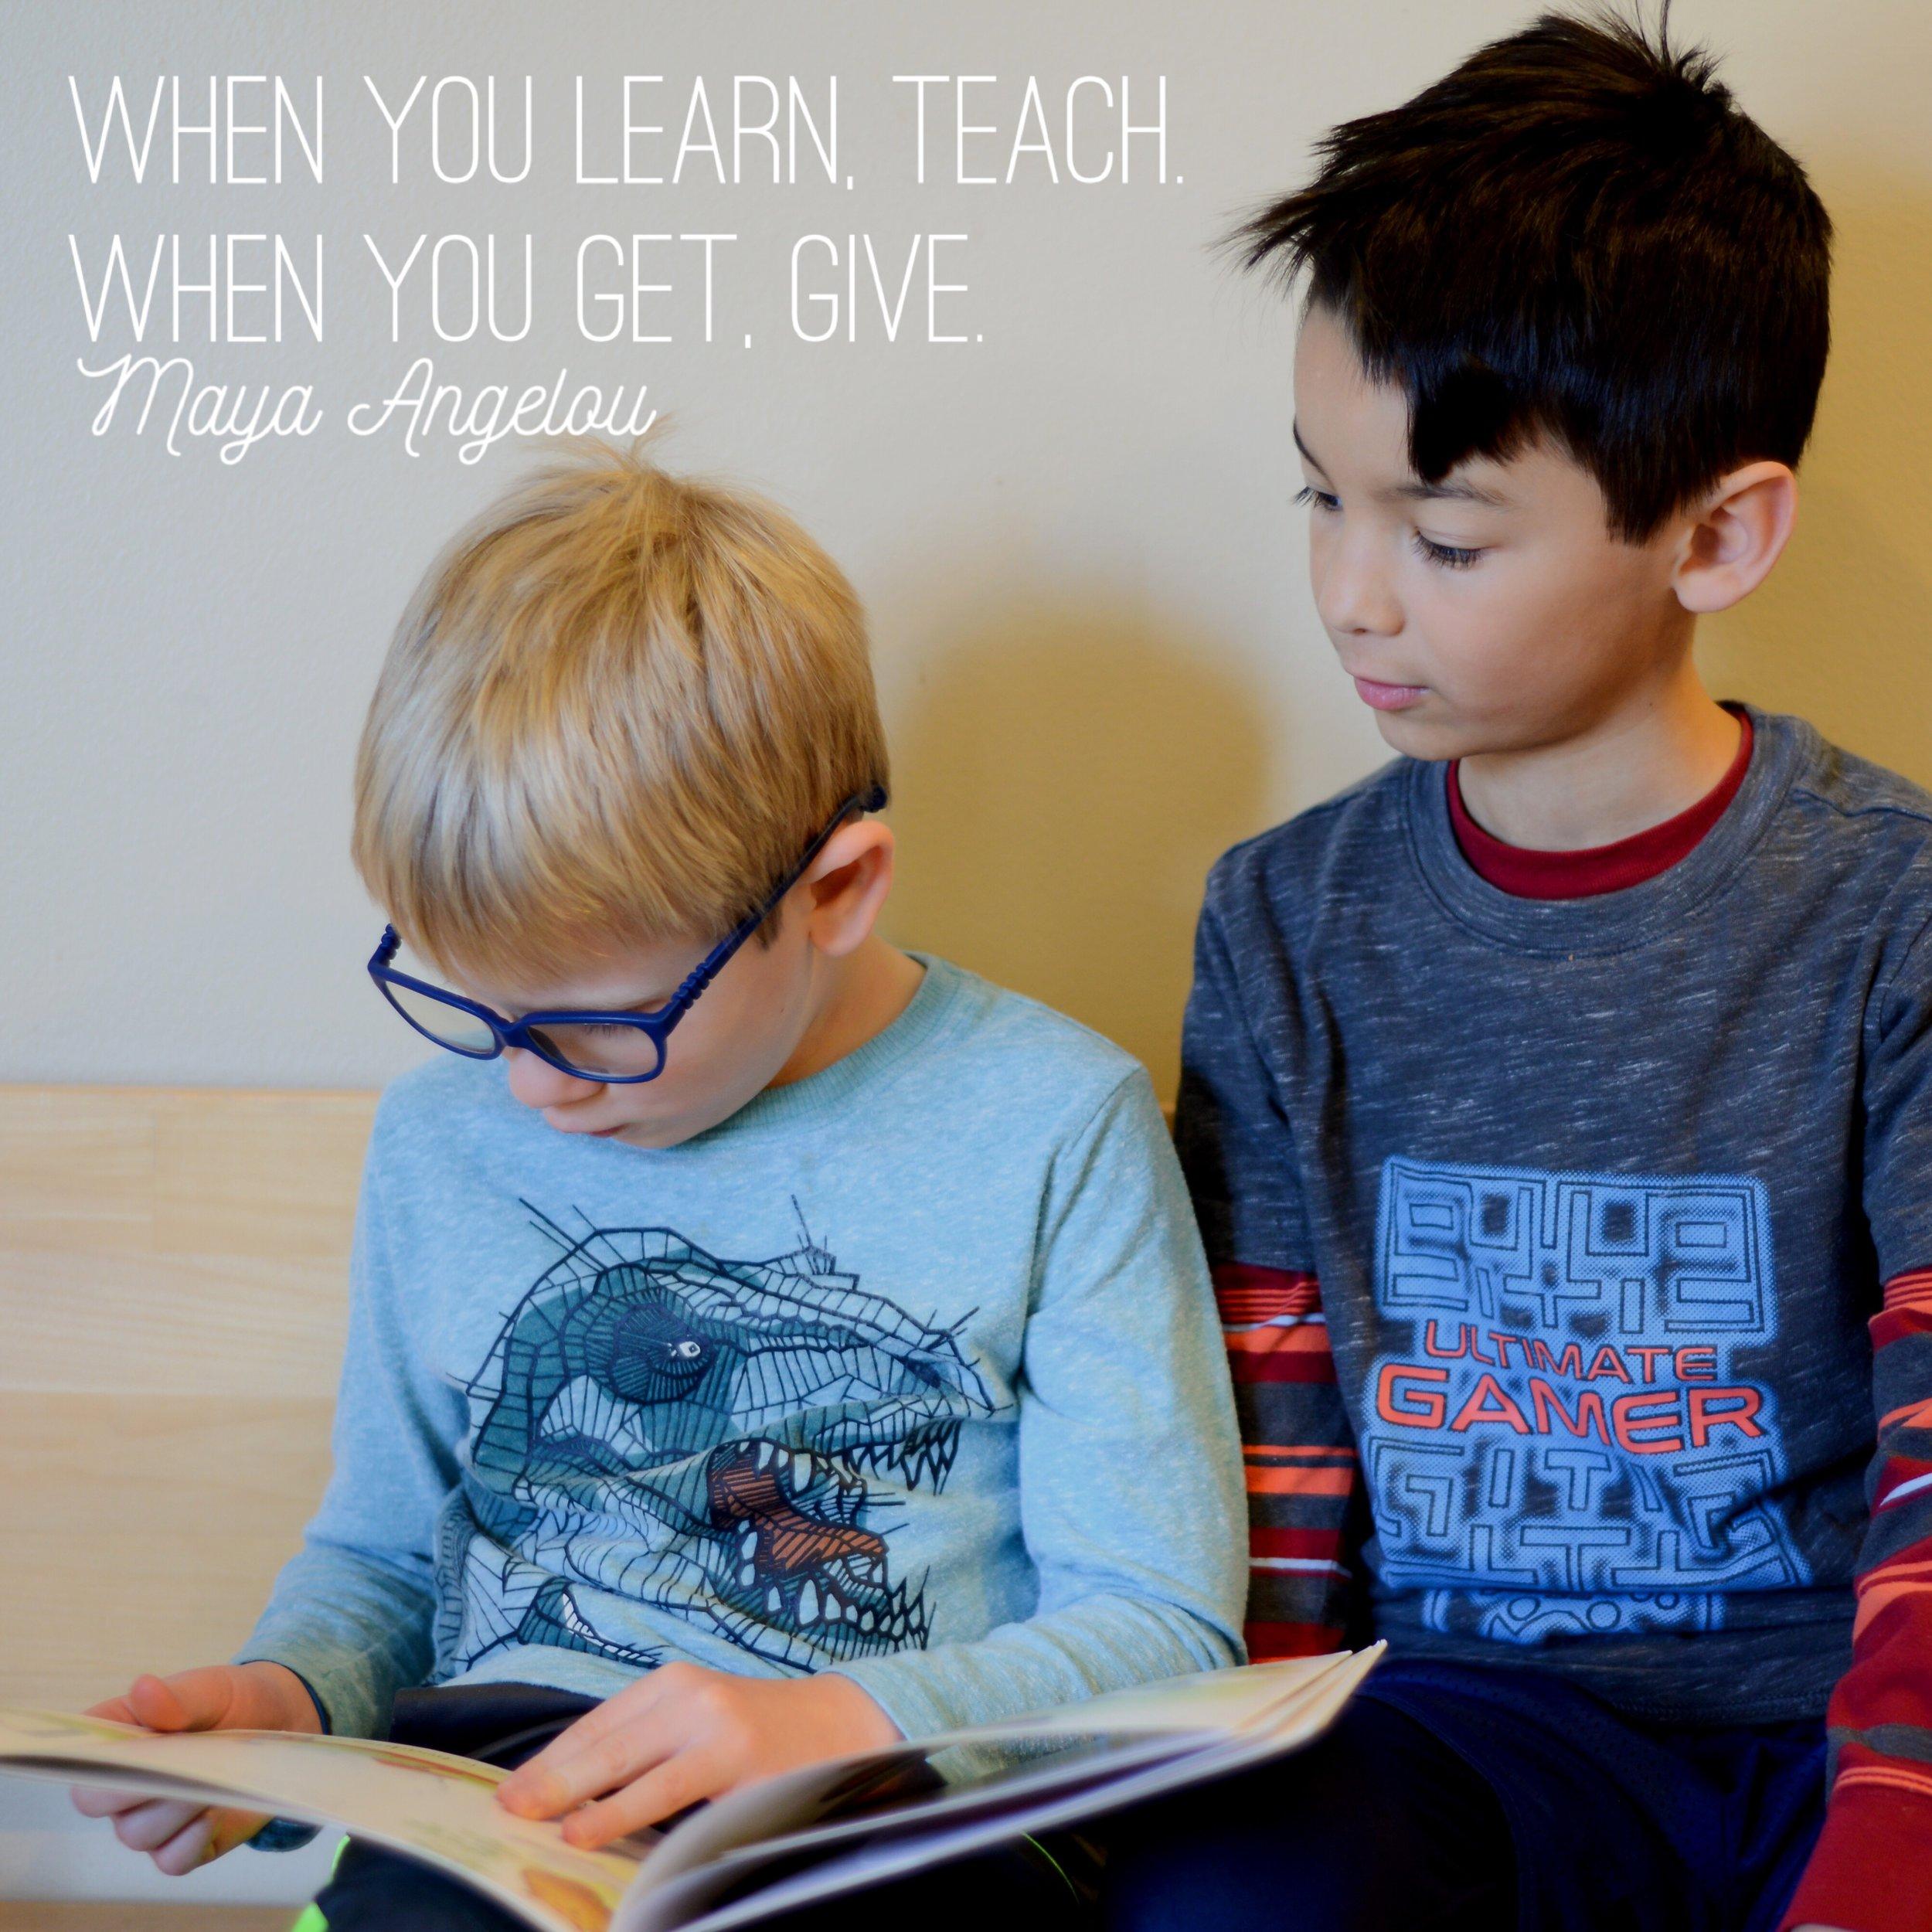 learnteach.jpeg